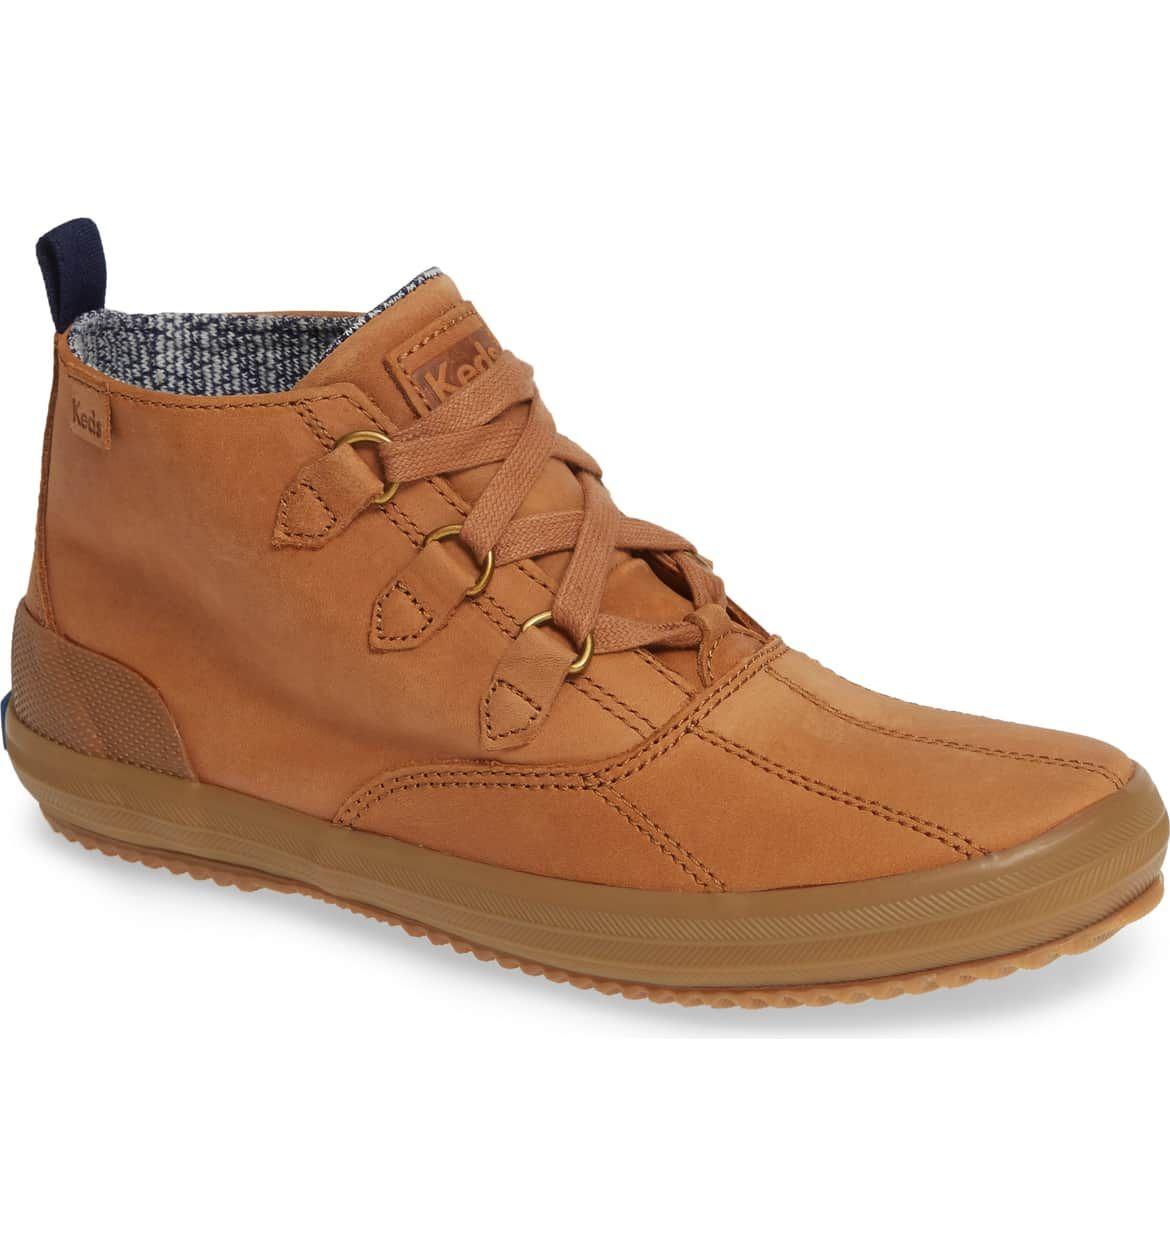 Chukka boots women, Leather keds